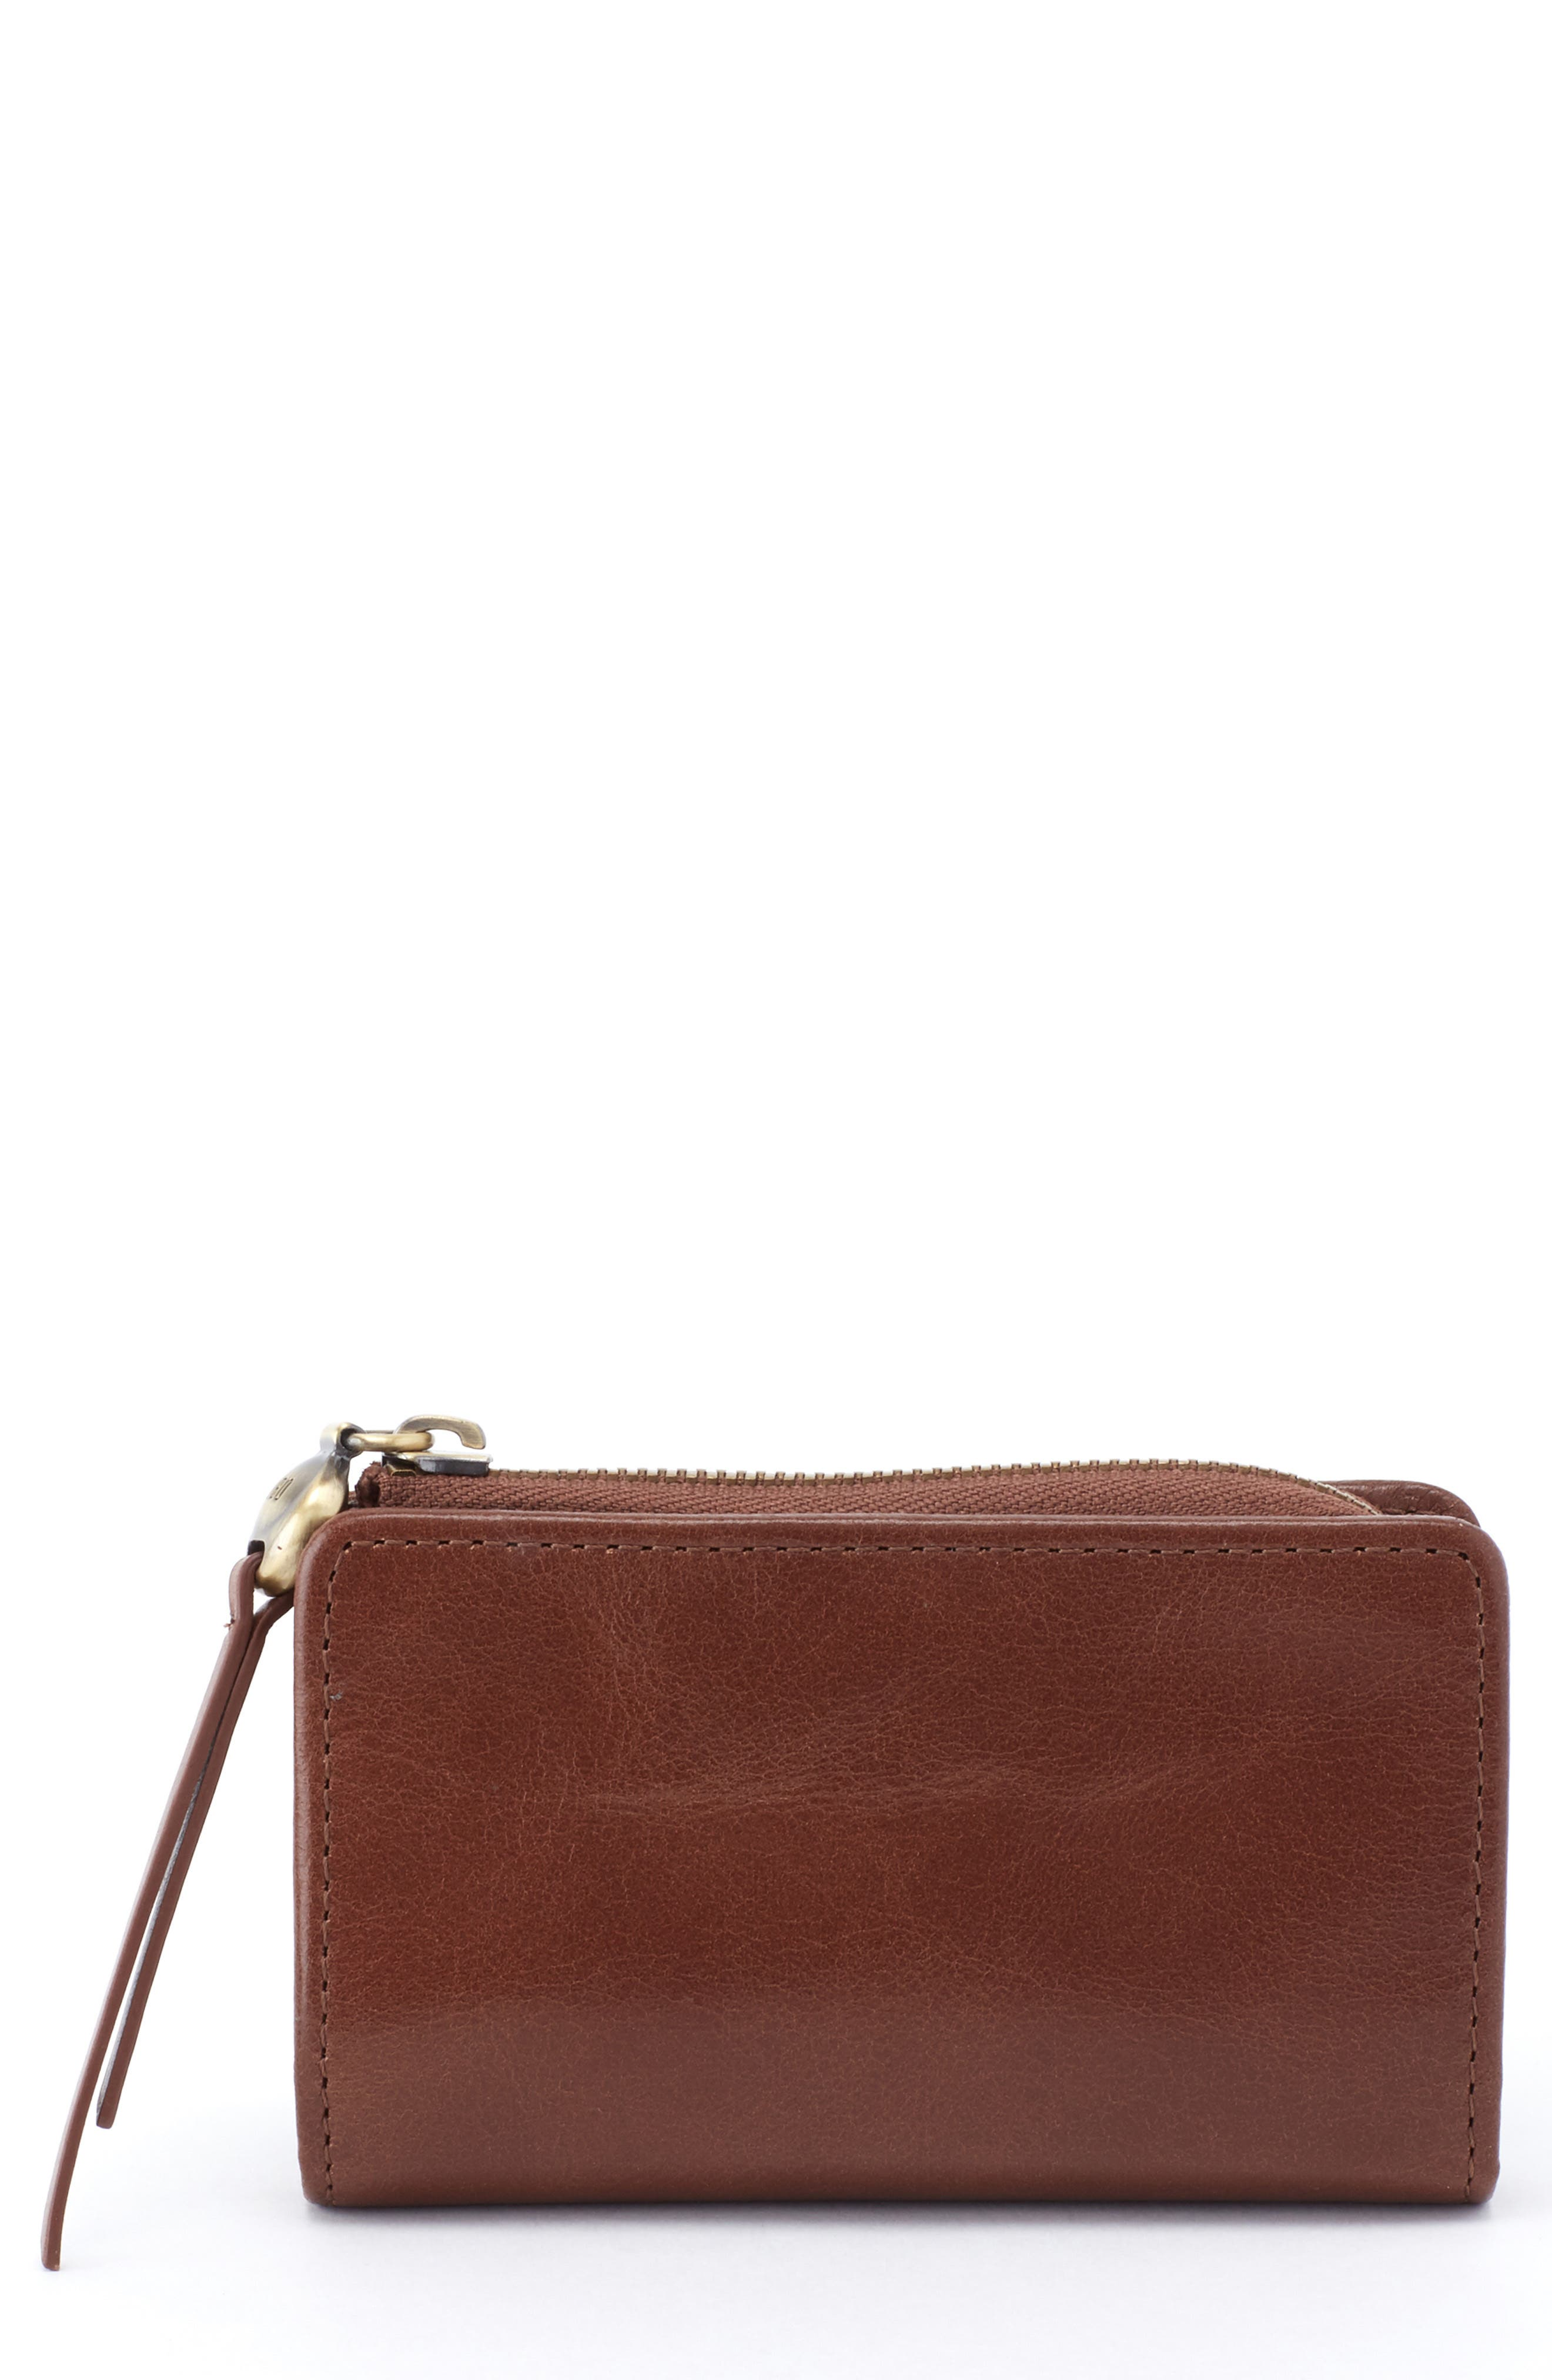 Dart Calfskin Leather Wallet,                             Main thumbnail 1, color,                             WOODLANDS